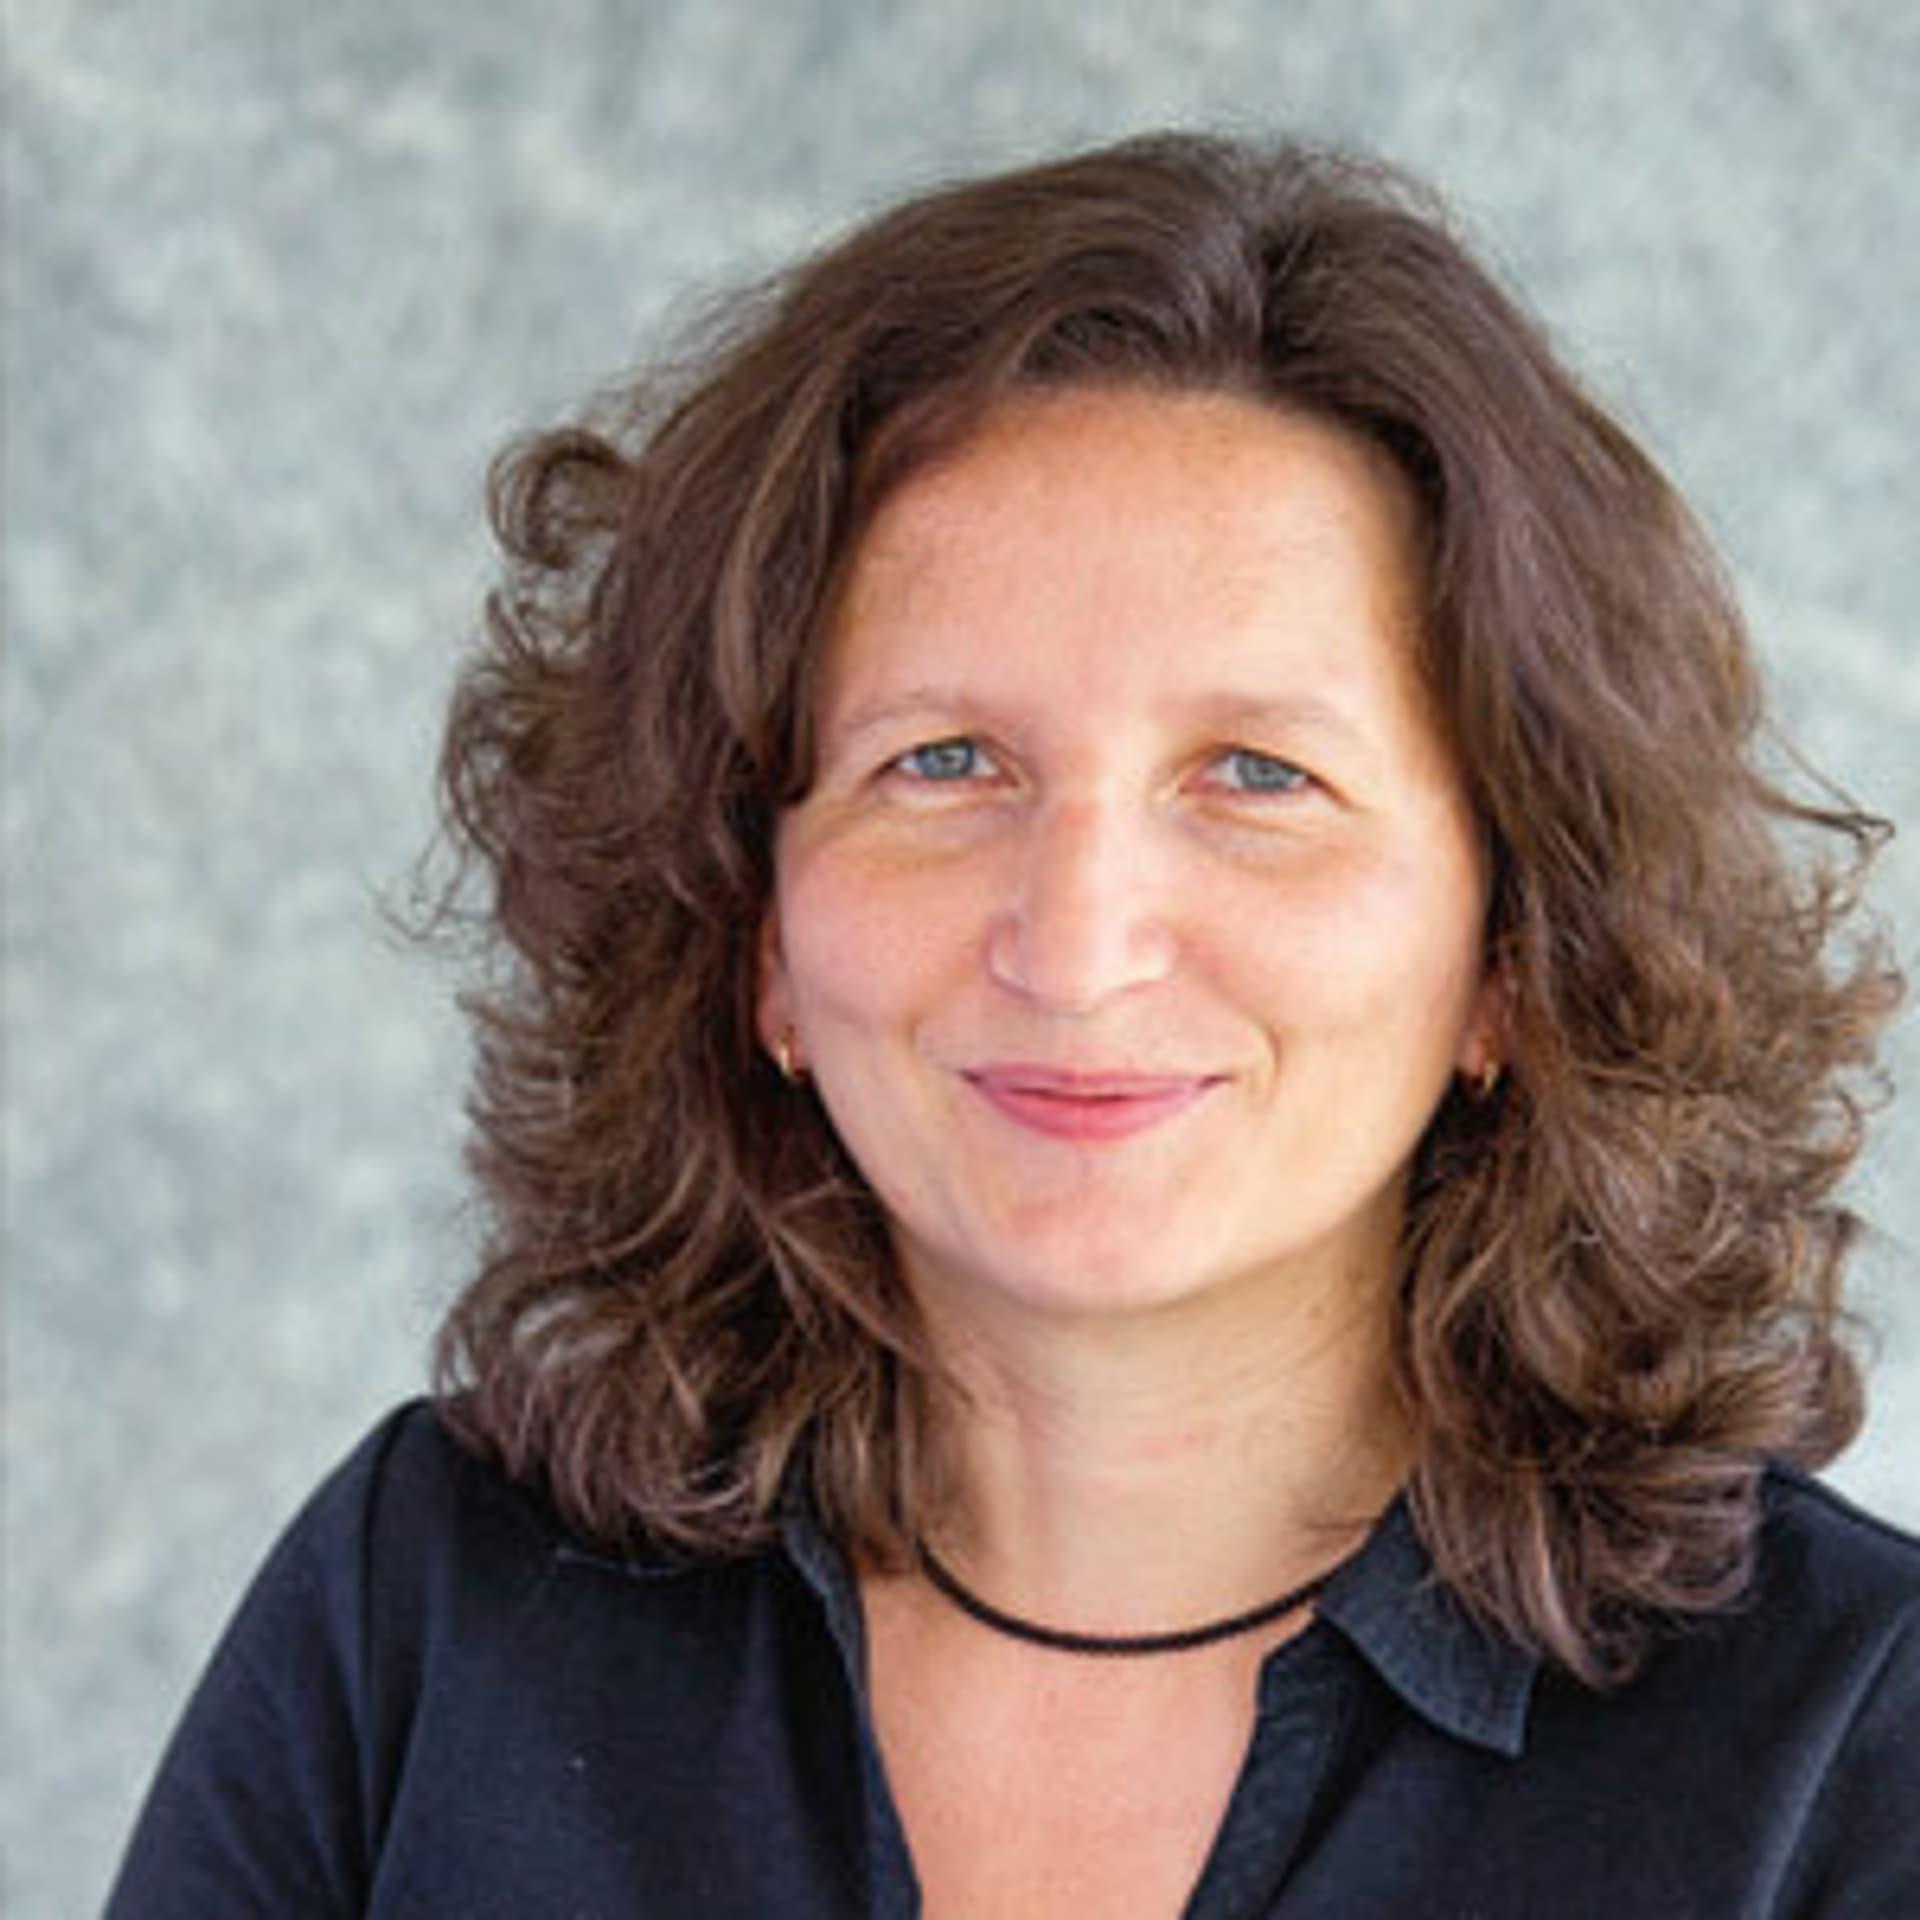 Barbara Altmann